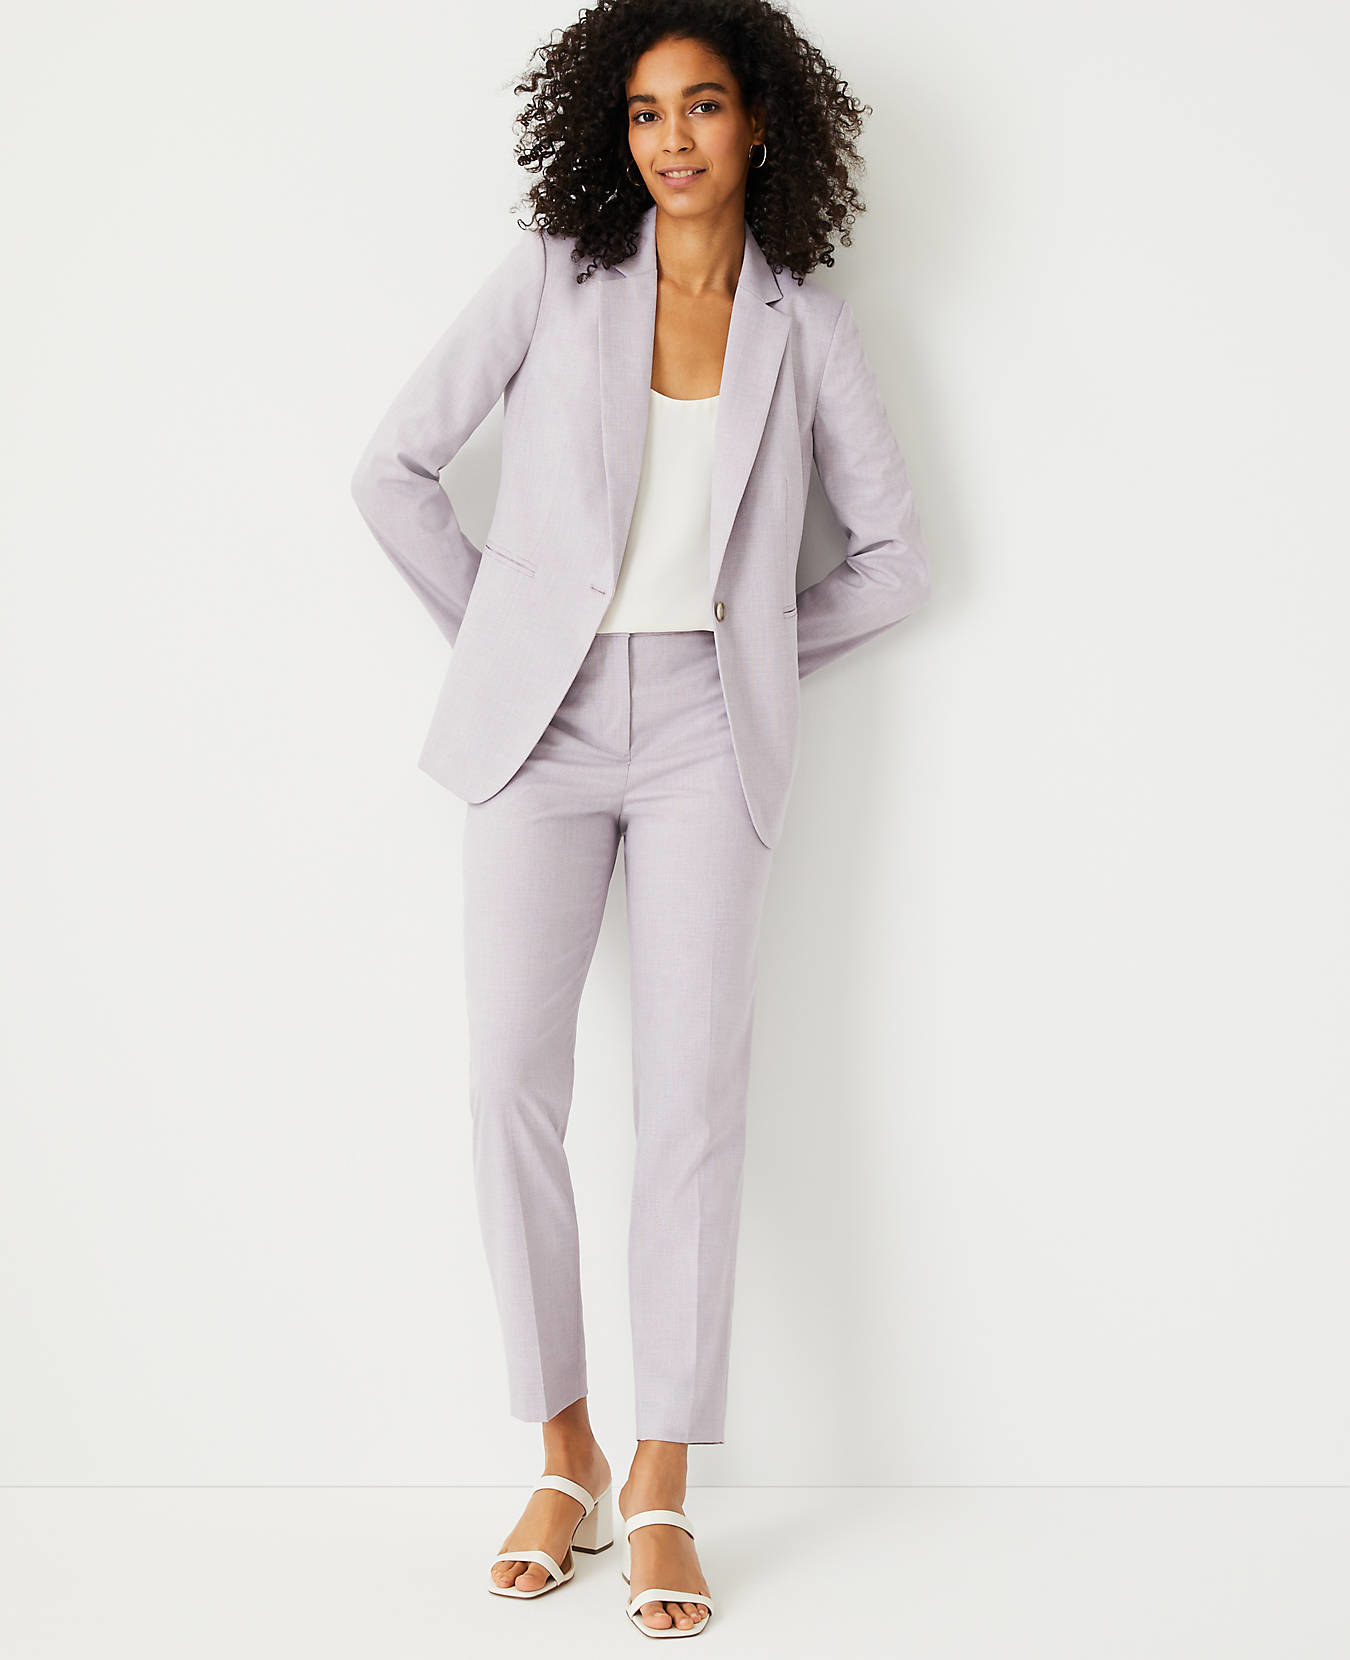 model wearing the purple blazer and pants